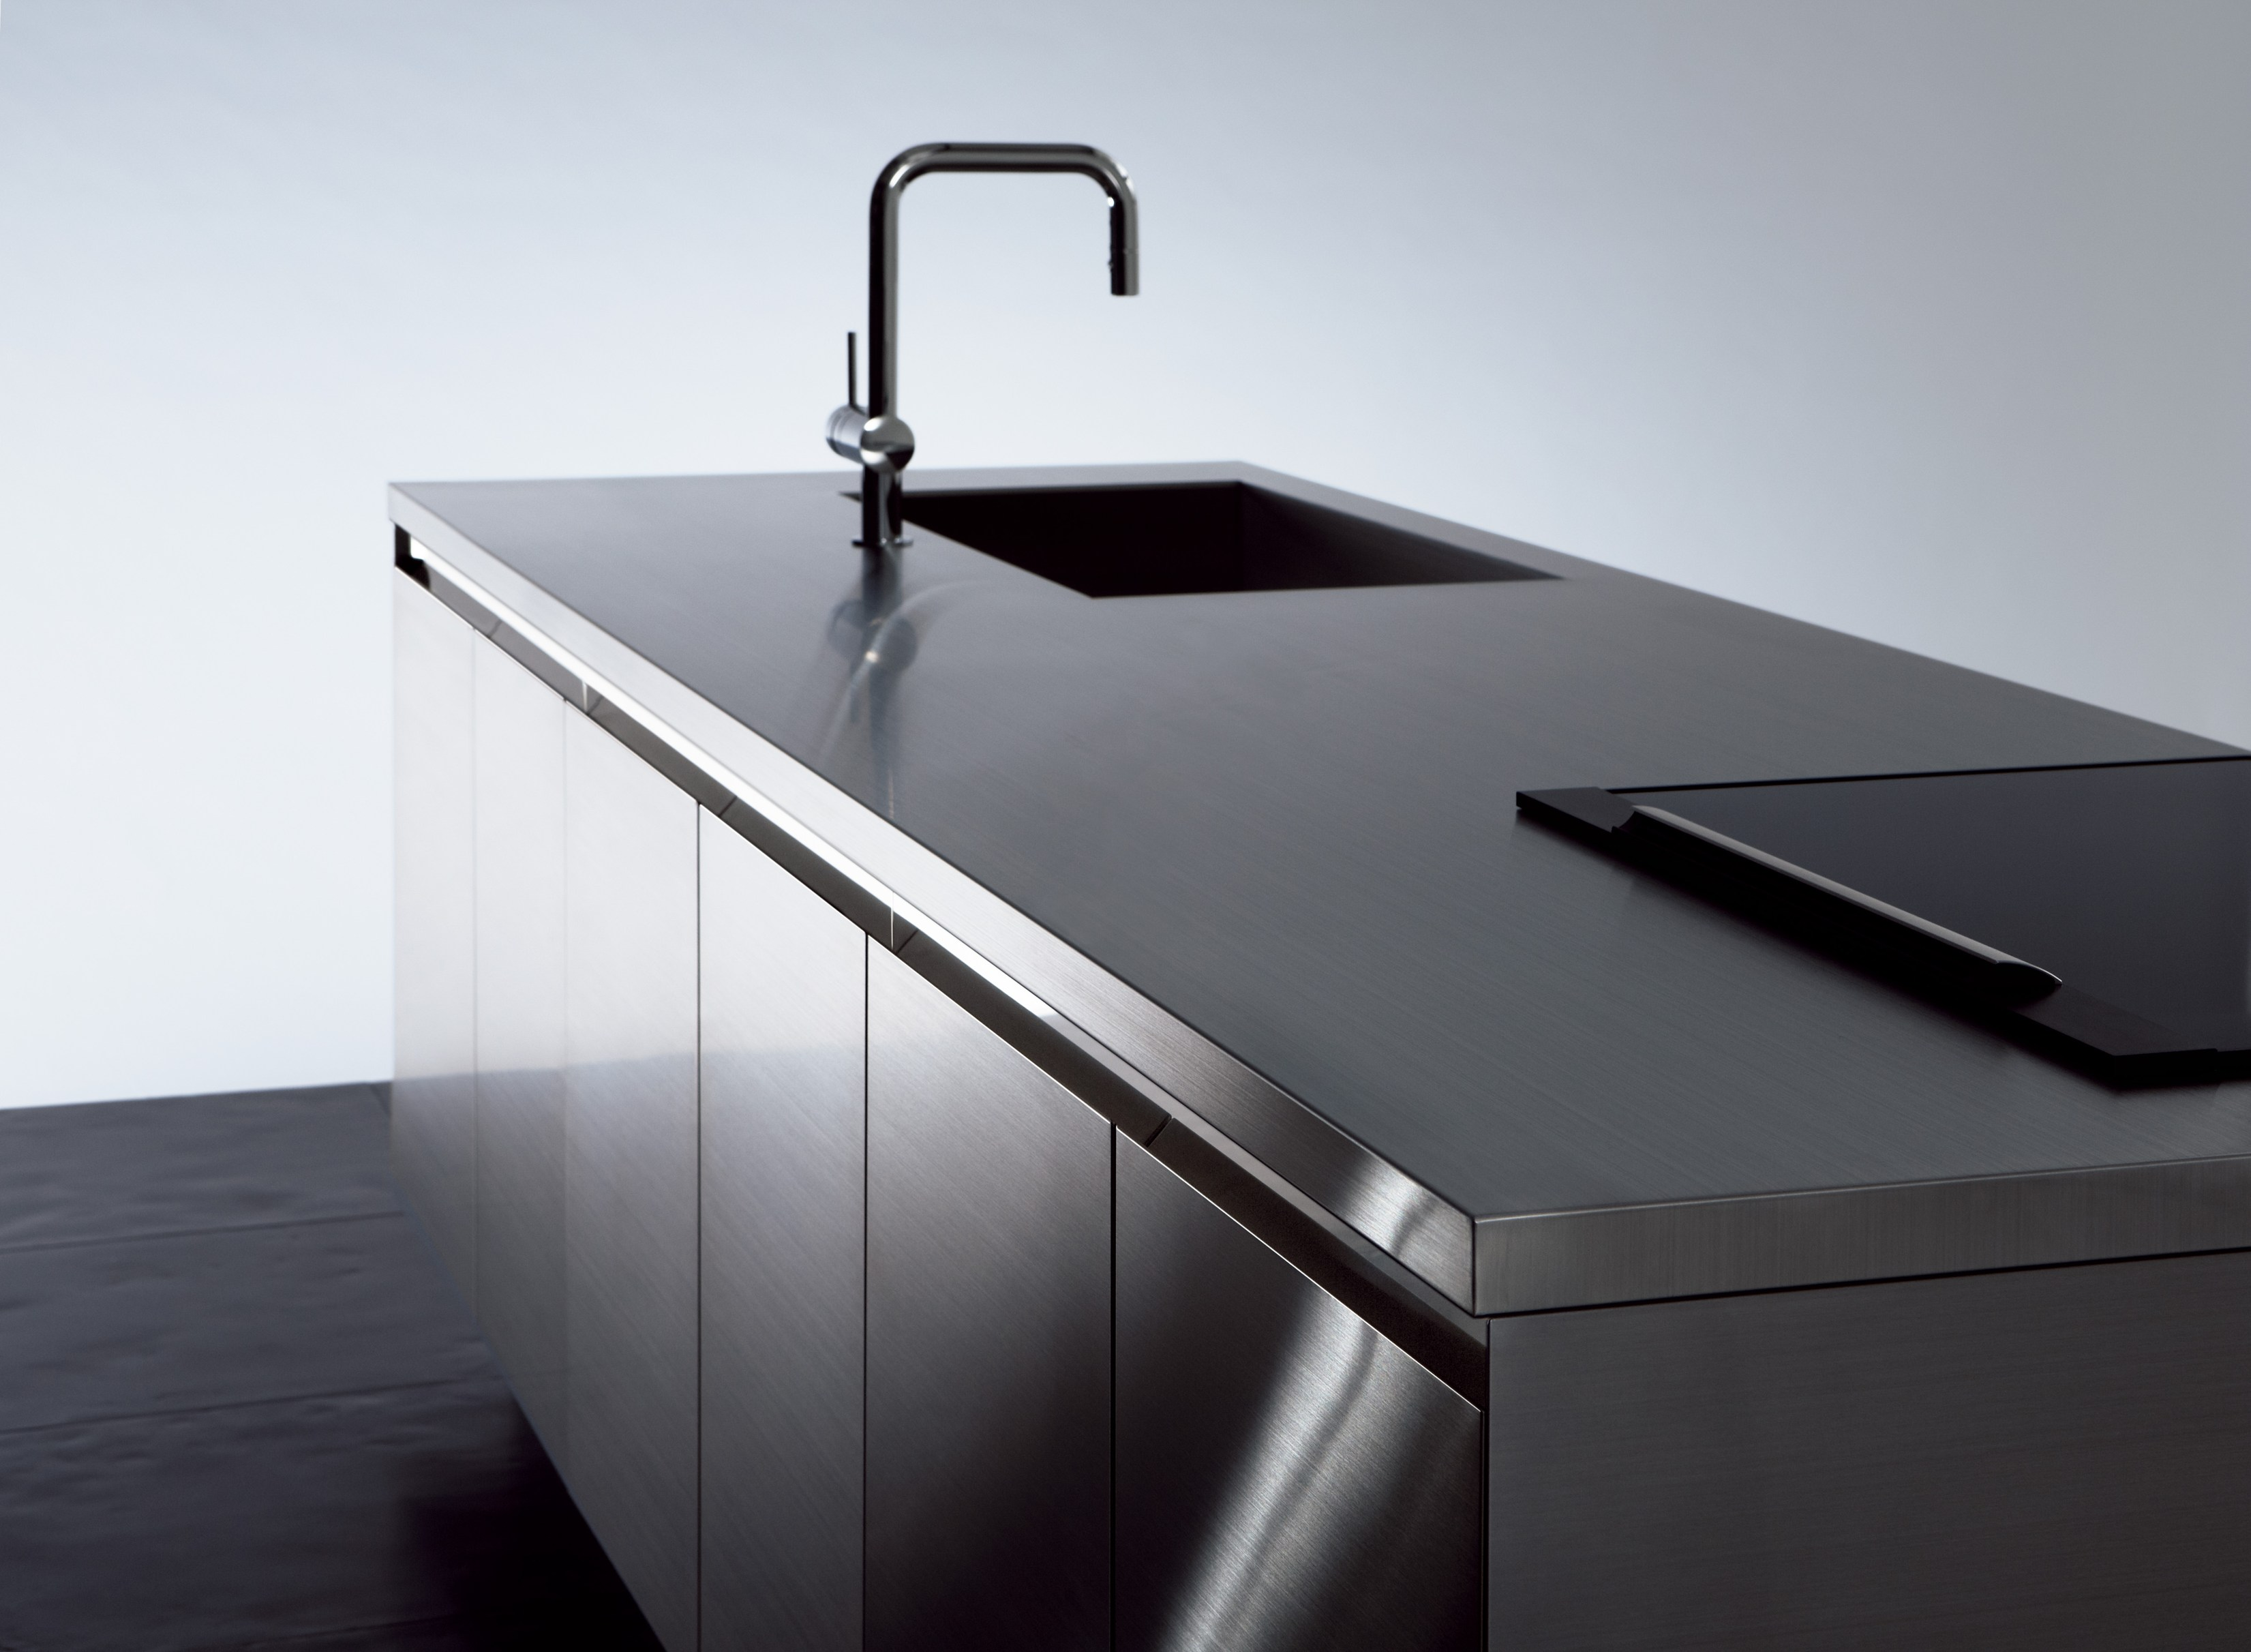 Cucina in acciaio inox senza maniglie grad45 by sanwa company - Cucina acciaio inox ...